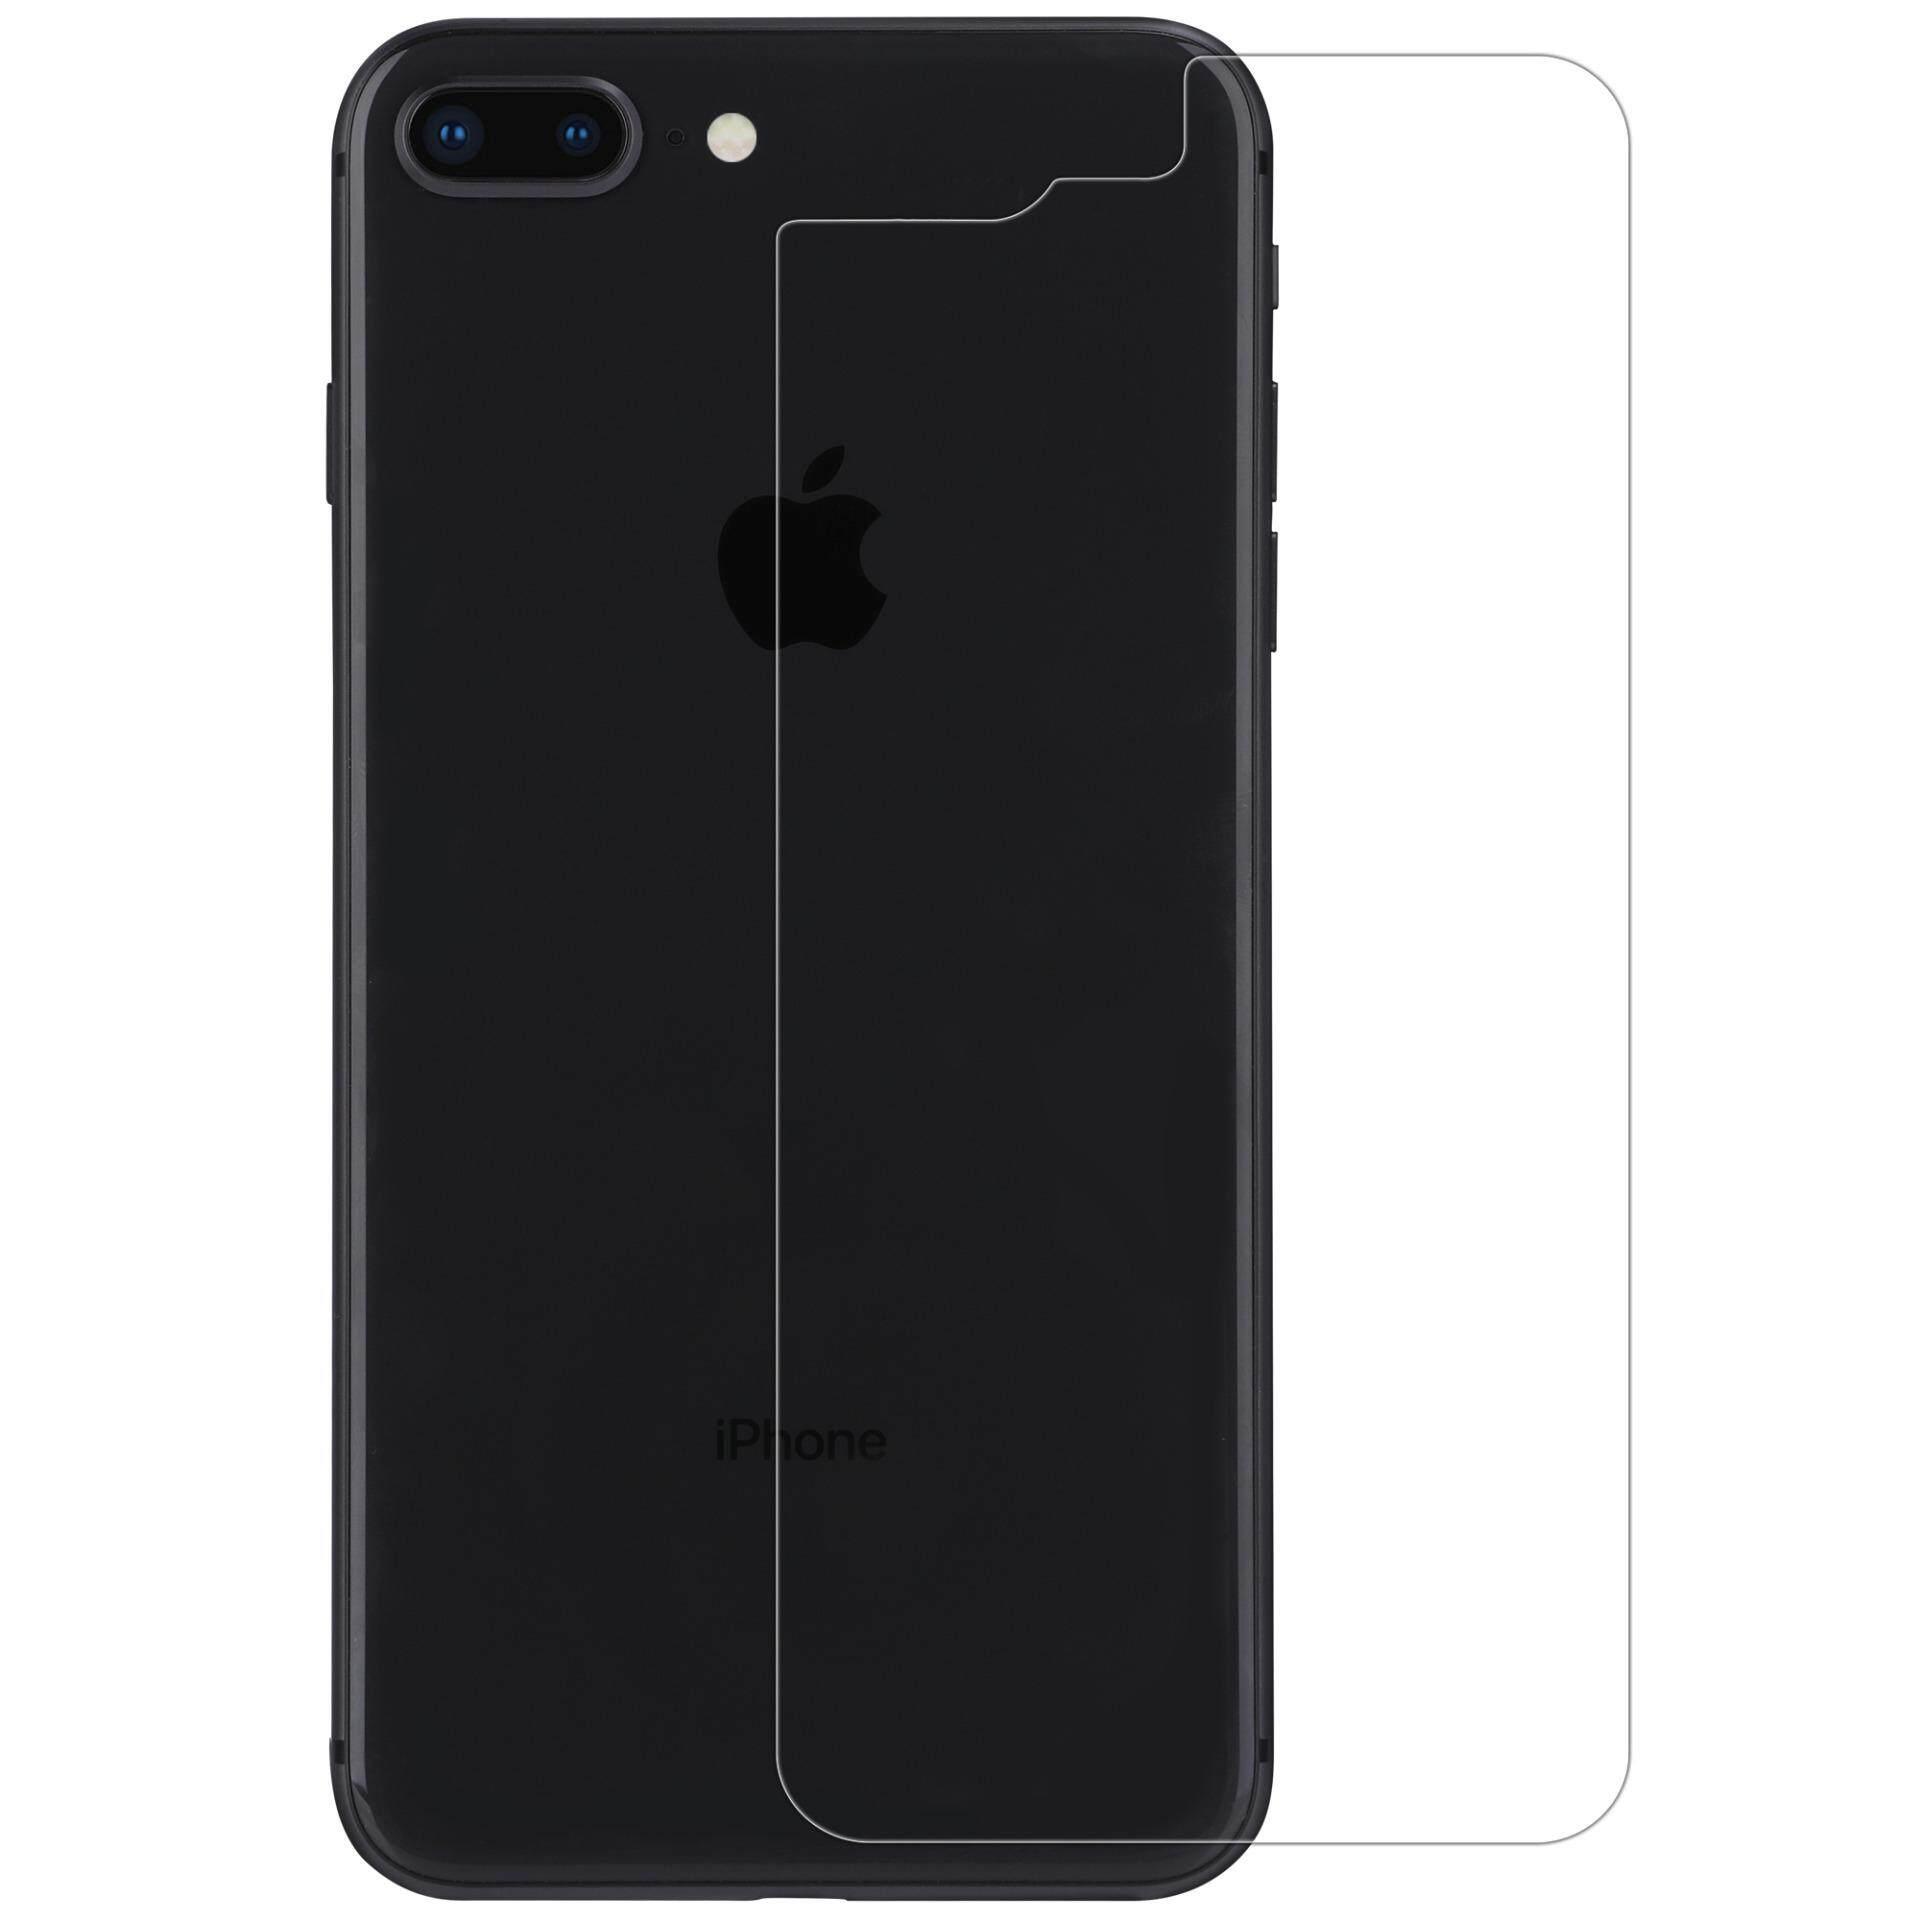 RUI HE Nillkin Back Screen Protector for iPhone 8 Plus Nillkin Amazing H Series 9H